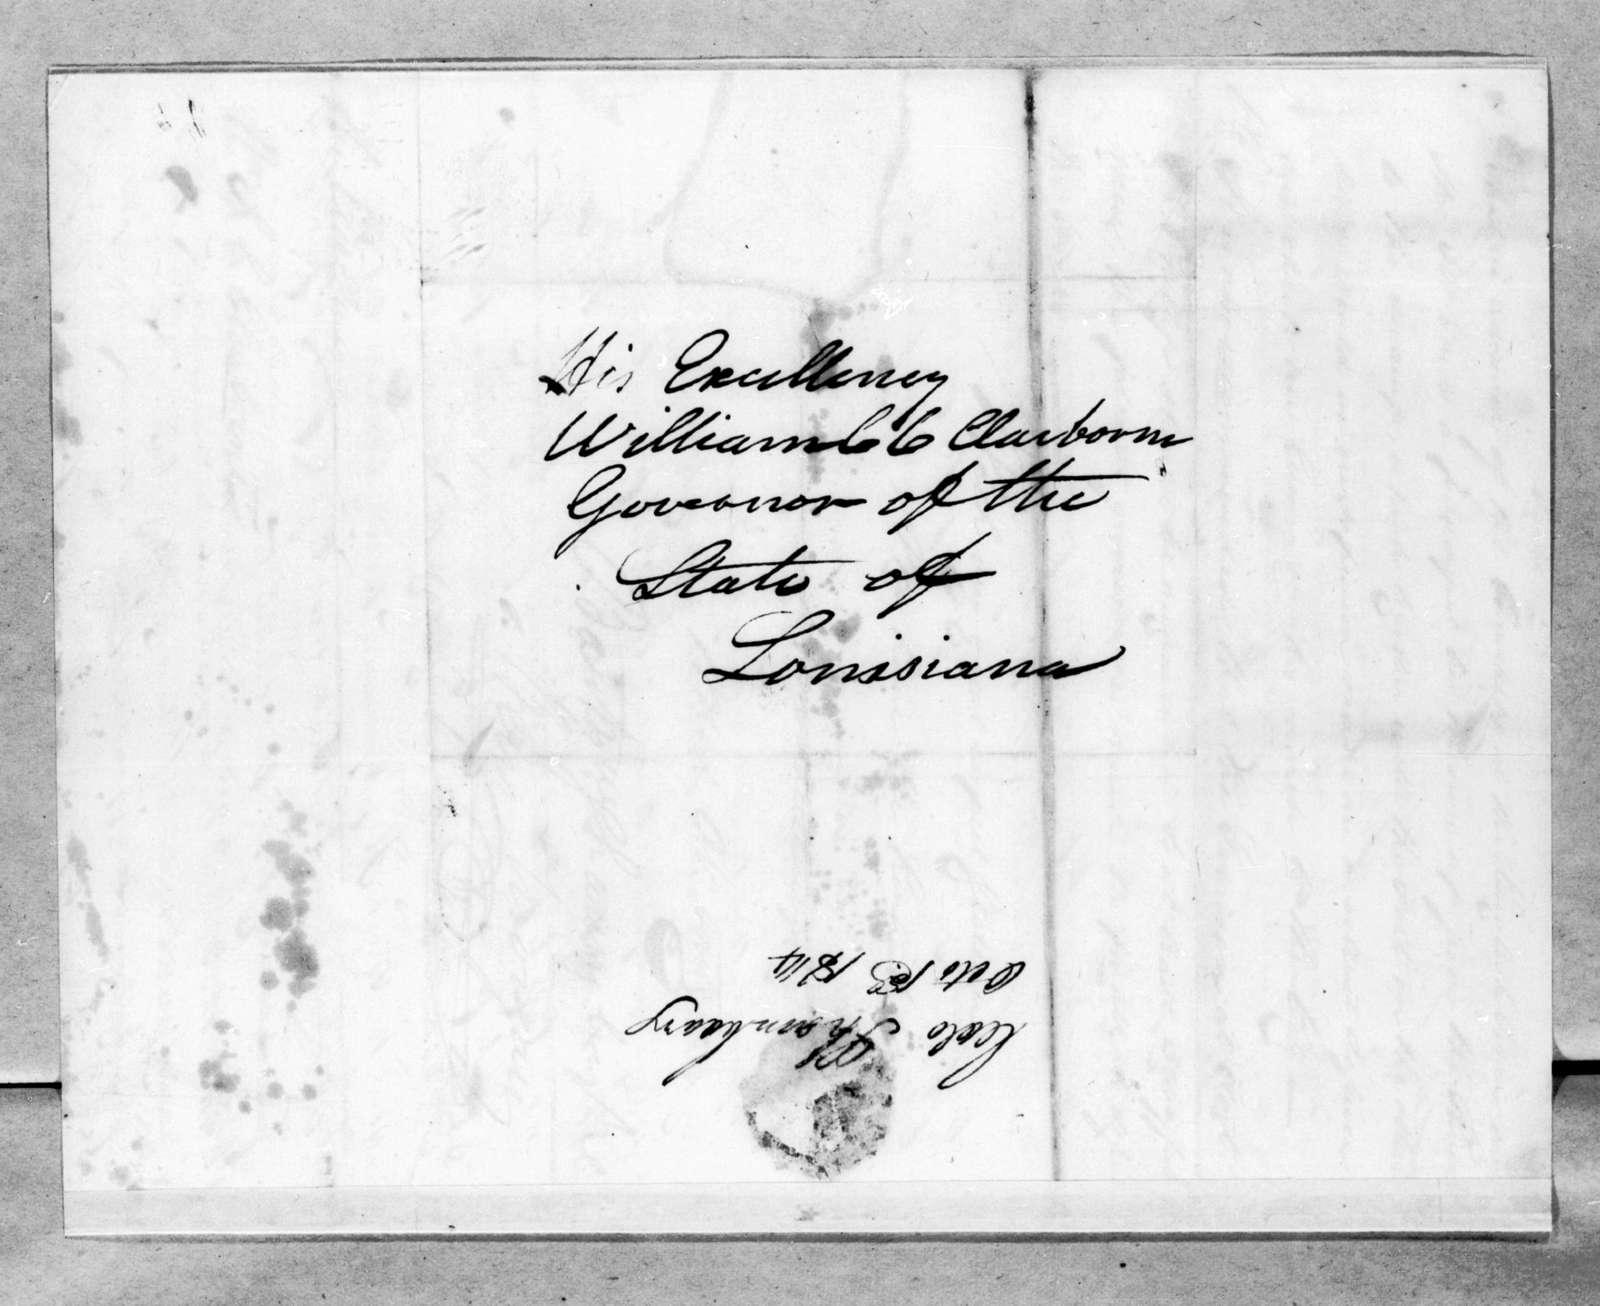 Benjamin Morgan to William Charles Cole Claiborne, October 31, 1814